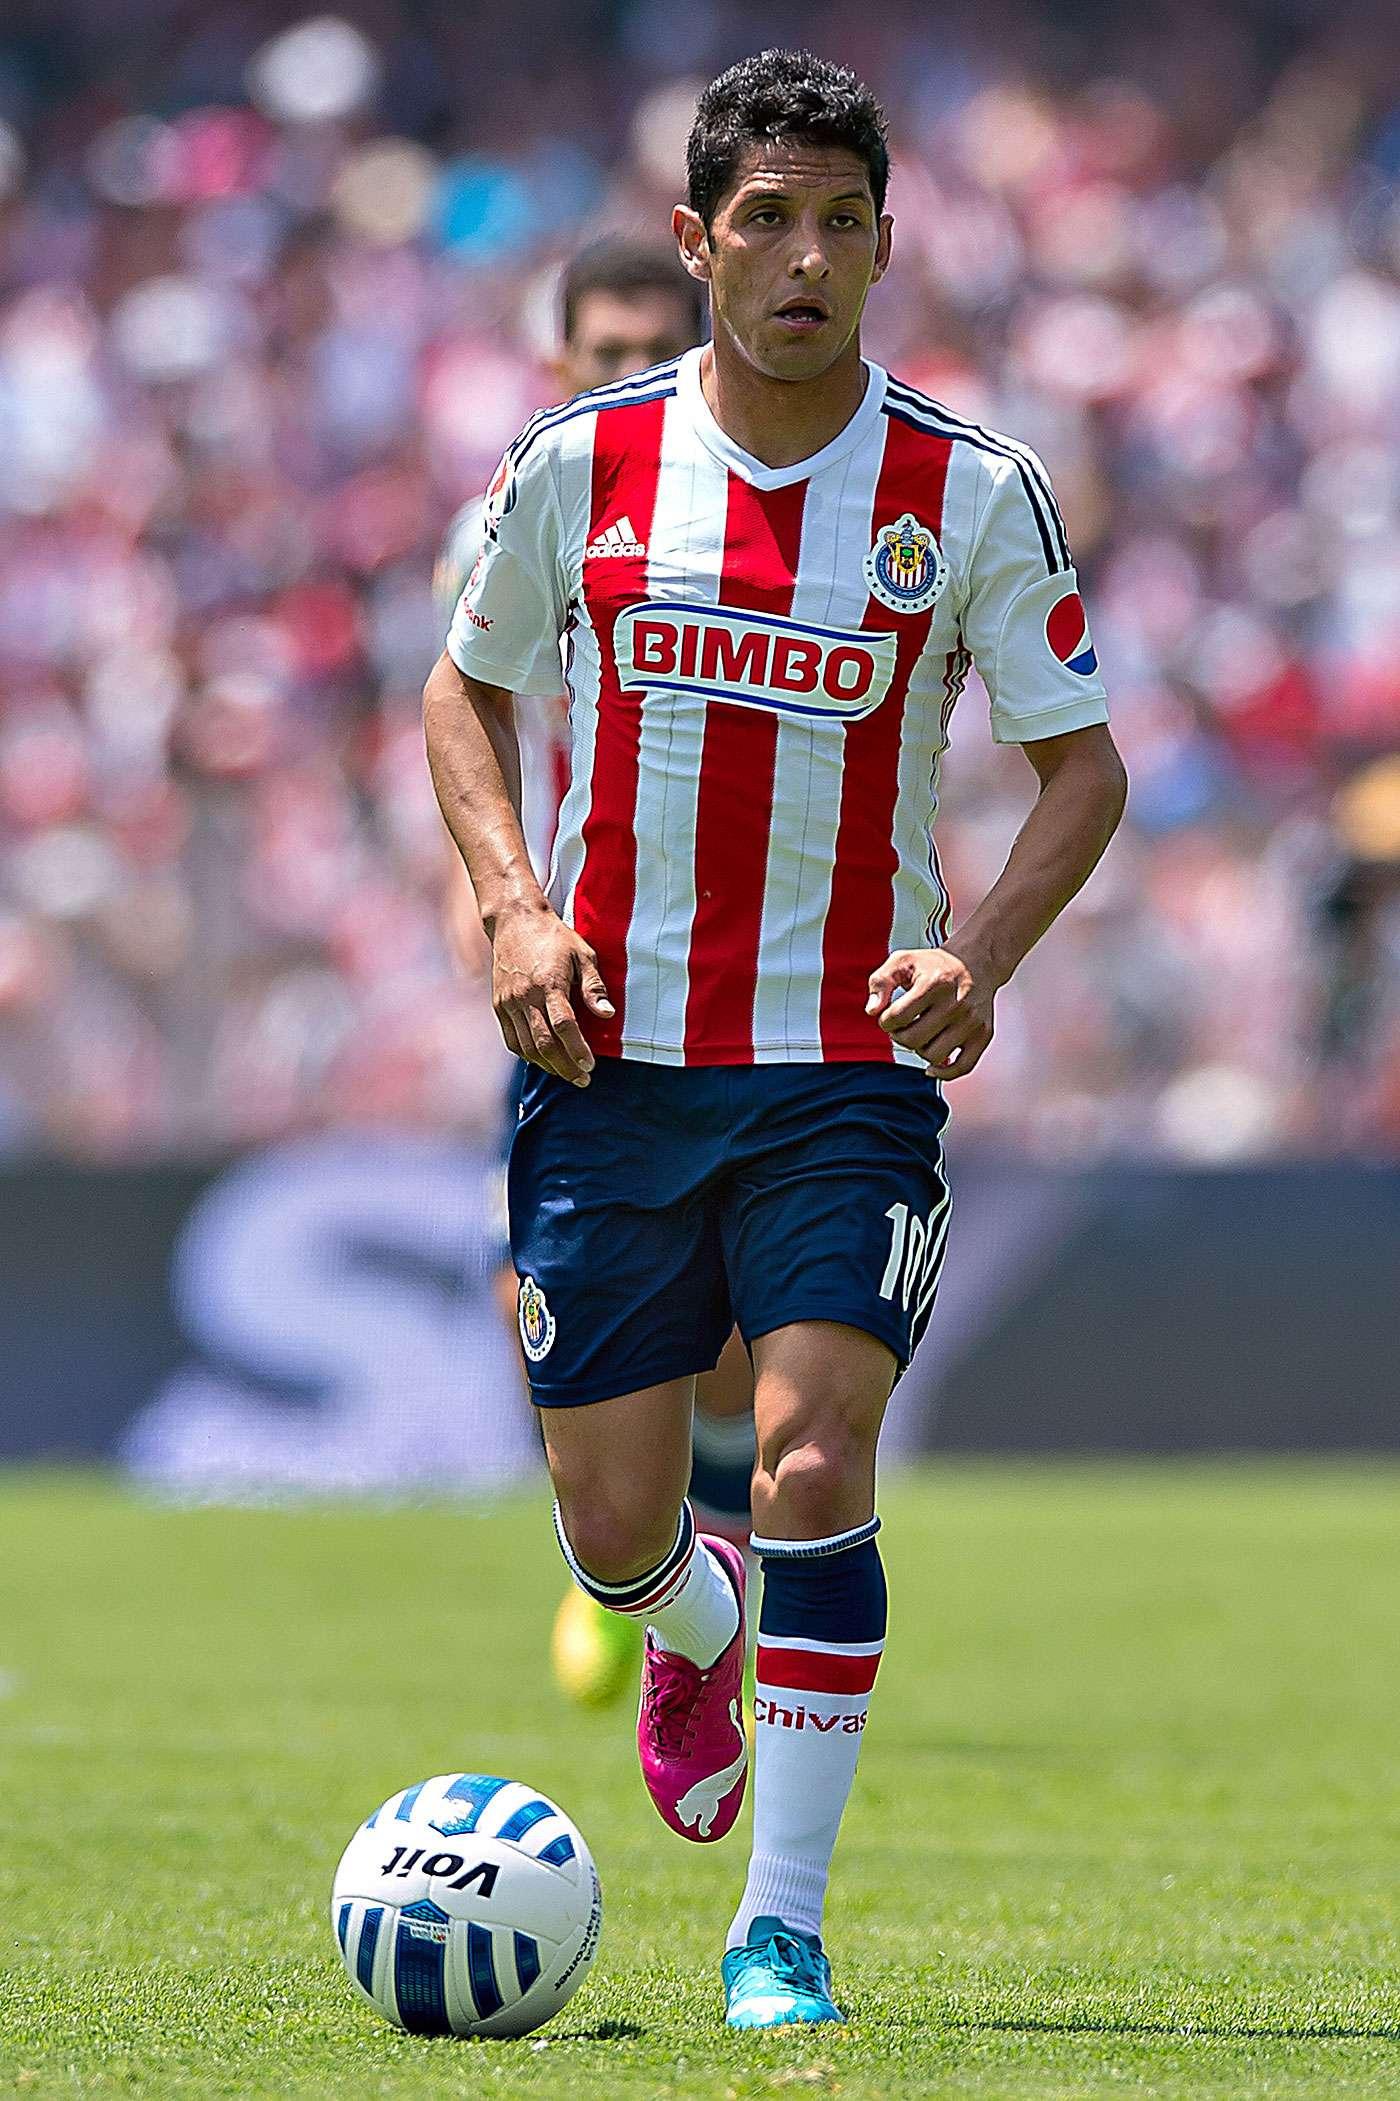 Roberto Maya/Mexsport